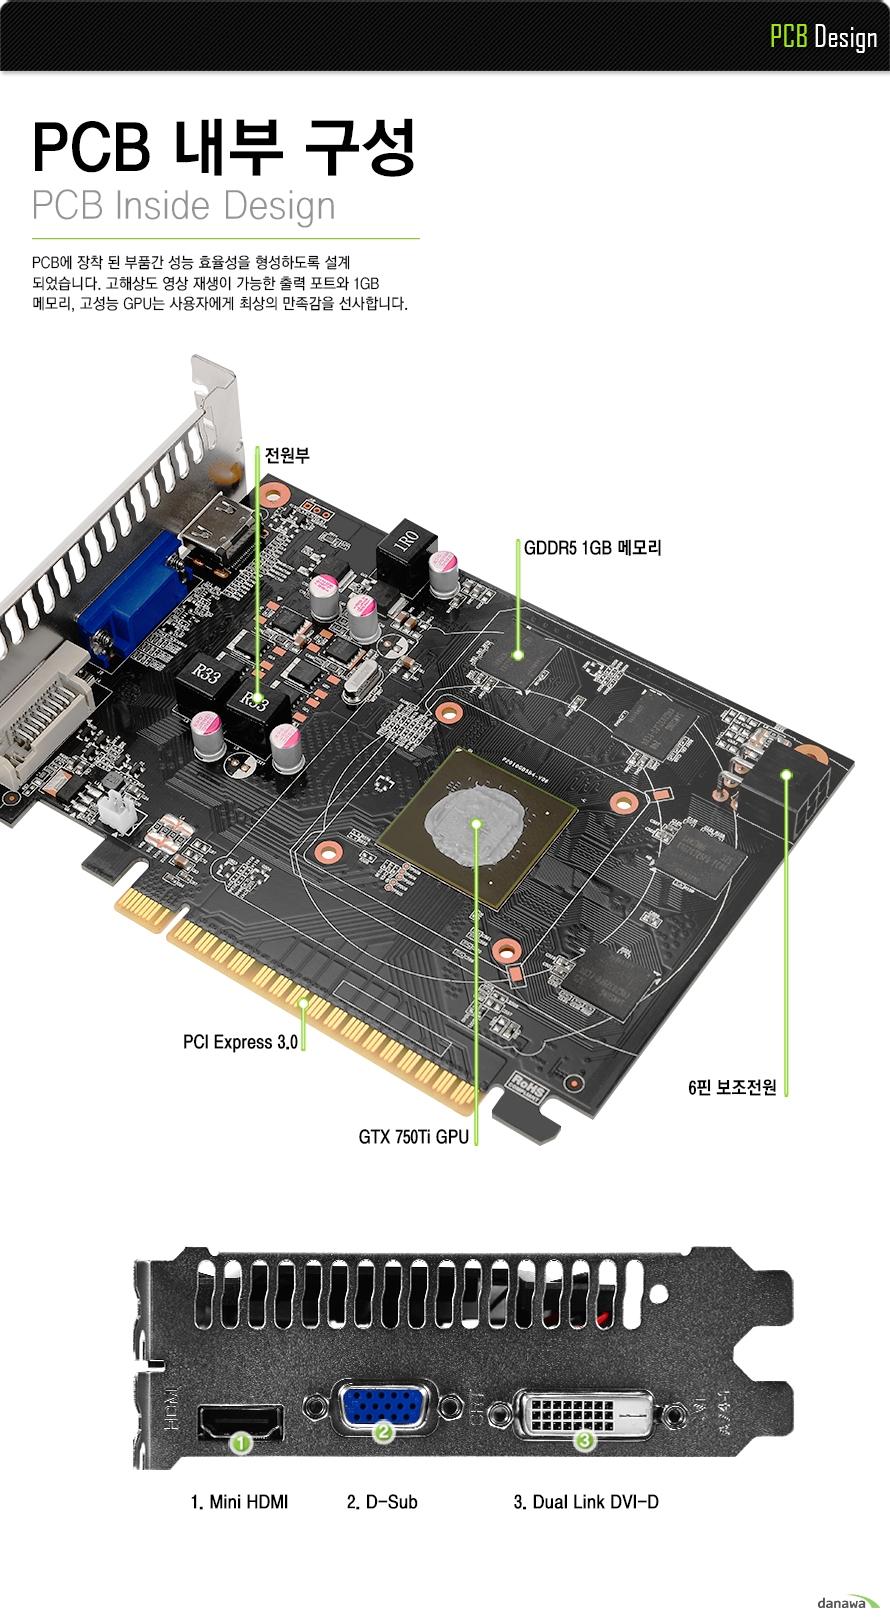 PCB DesignPCB 내부 구성PCB Inside DesignPCB에 장착 된 부품간 성능 효율성을 형성하도록 설계 되었습니다. 고해상도 영상 재생이 가능한 출력 포트와 2GB 메모리, 고성능 GPU는 사용자에게 최상의 만족감을 선사합니다.전원부 / PCI Express 3.0 / GDDR5 2GB 메모리 / GTX 750 GPU후면포트 Mini HDMI /  Dual Link DVI-D /  D-sub